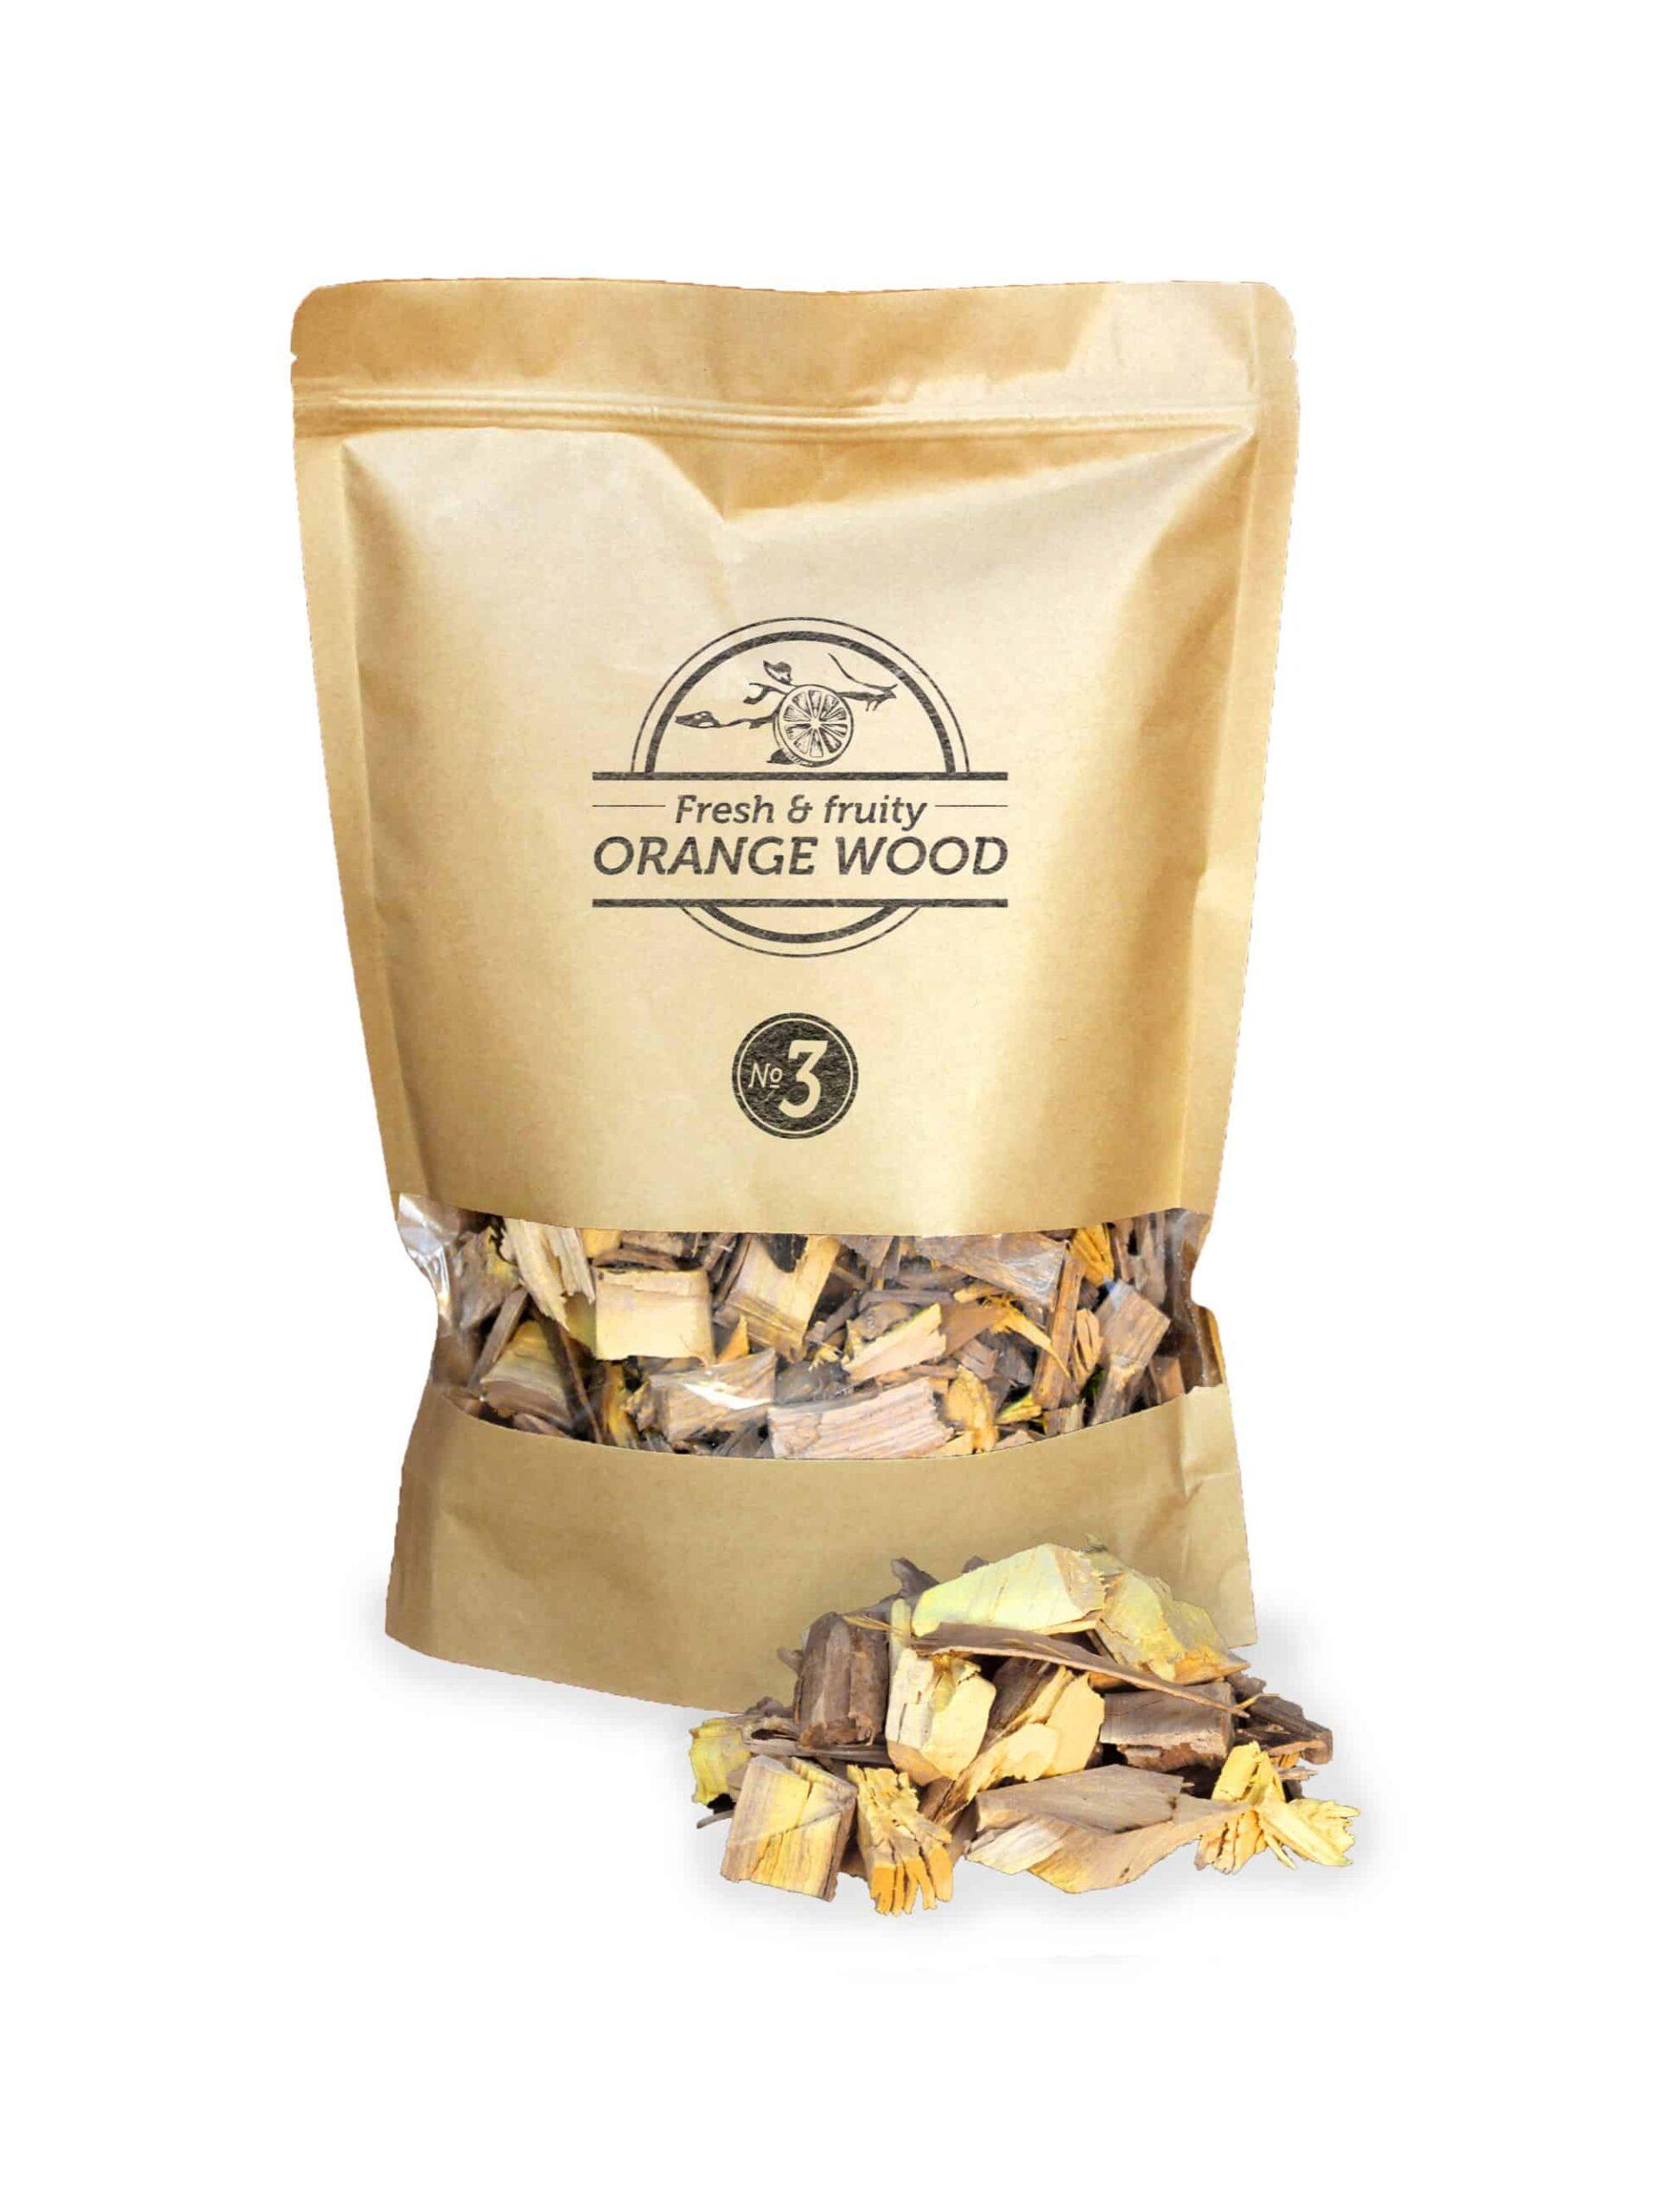 SOW orange chips